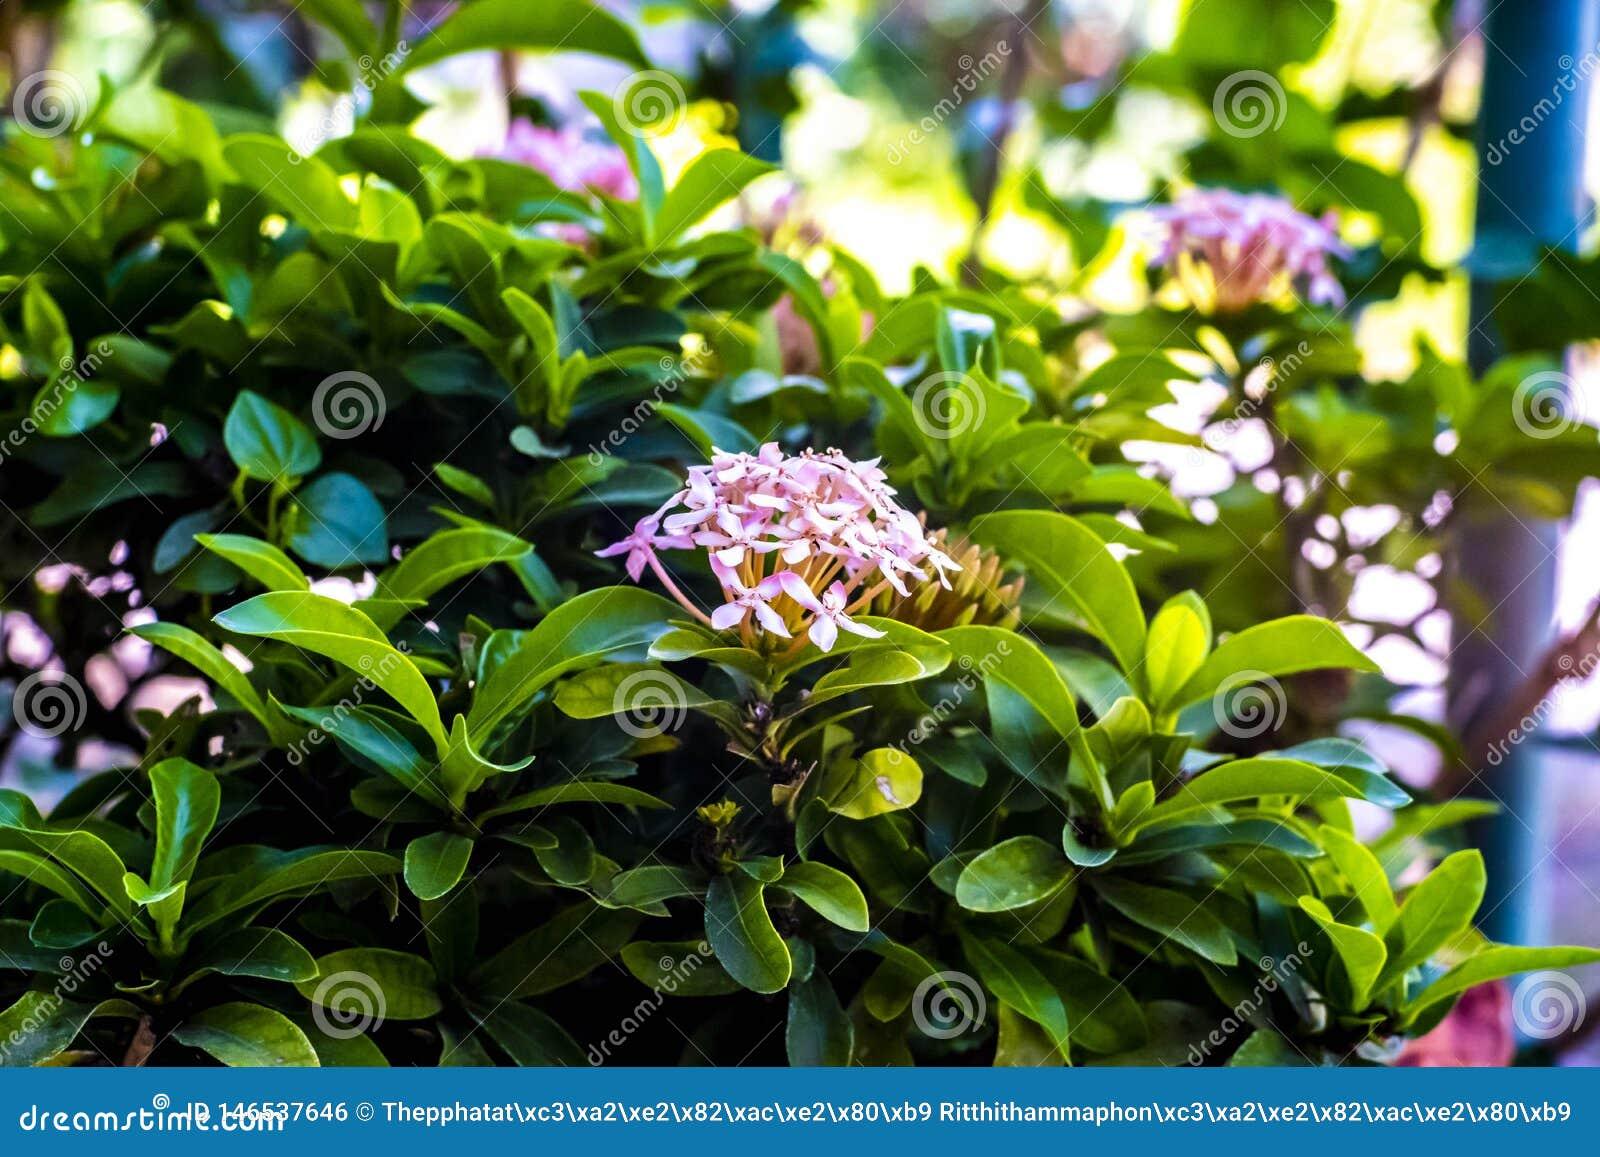 Kolca kwiatu ziele? w ten spos?b w ten spos?b w ten spos?b